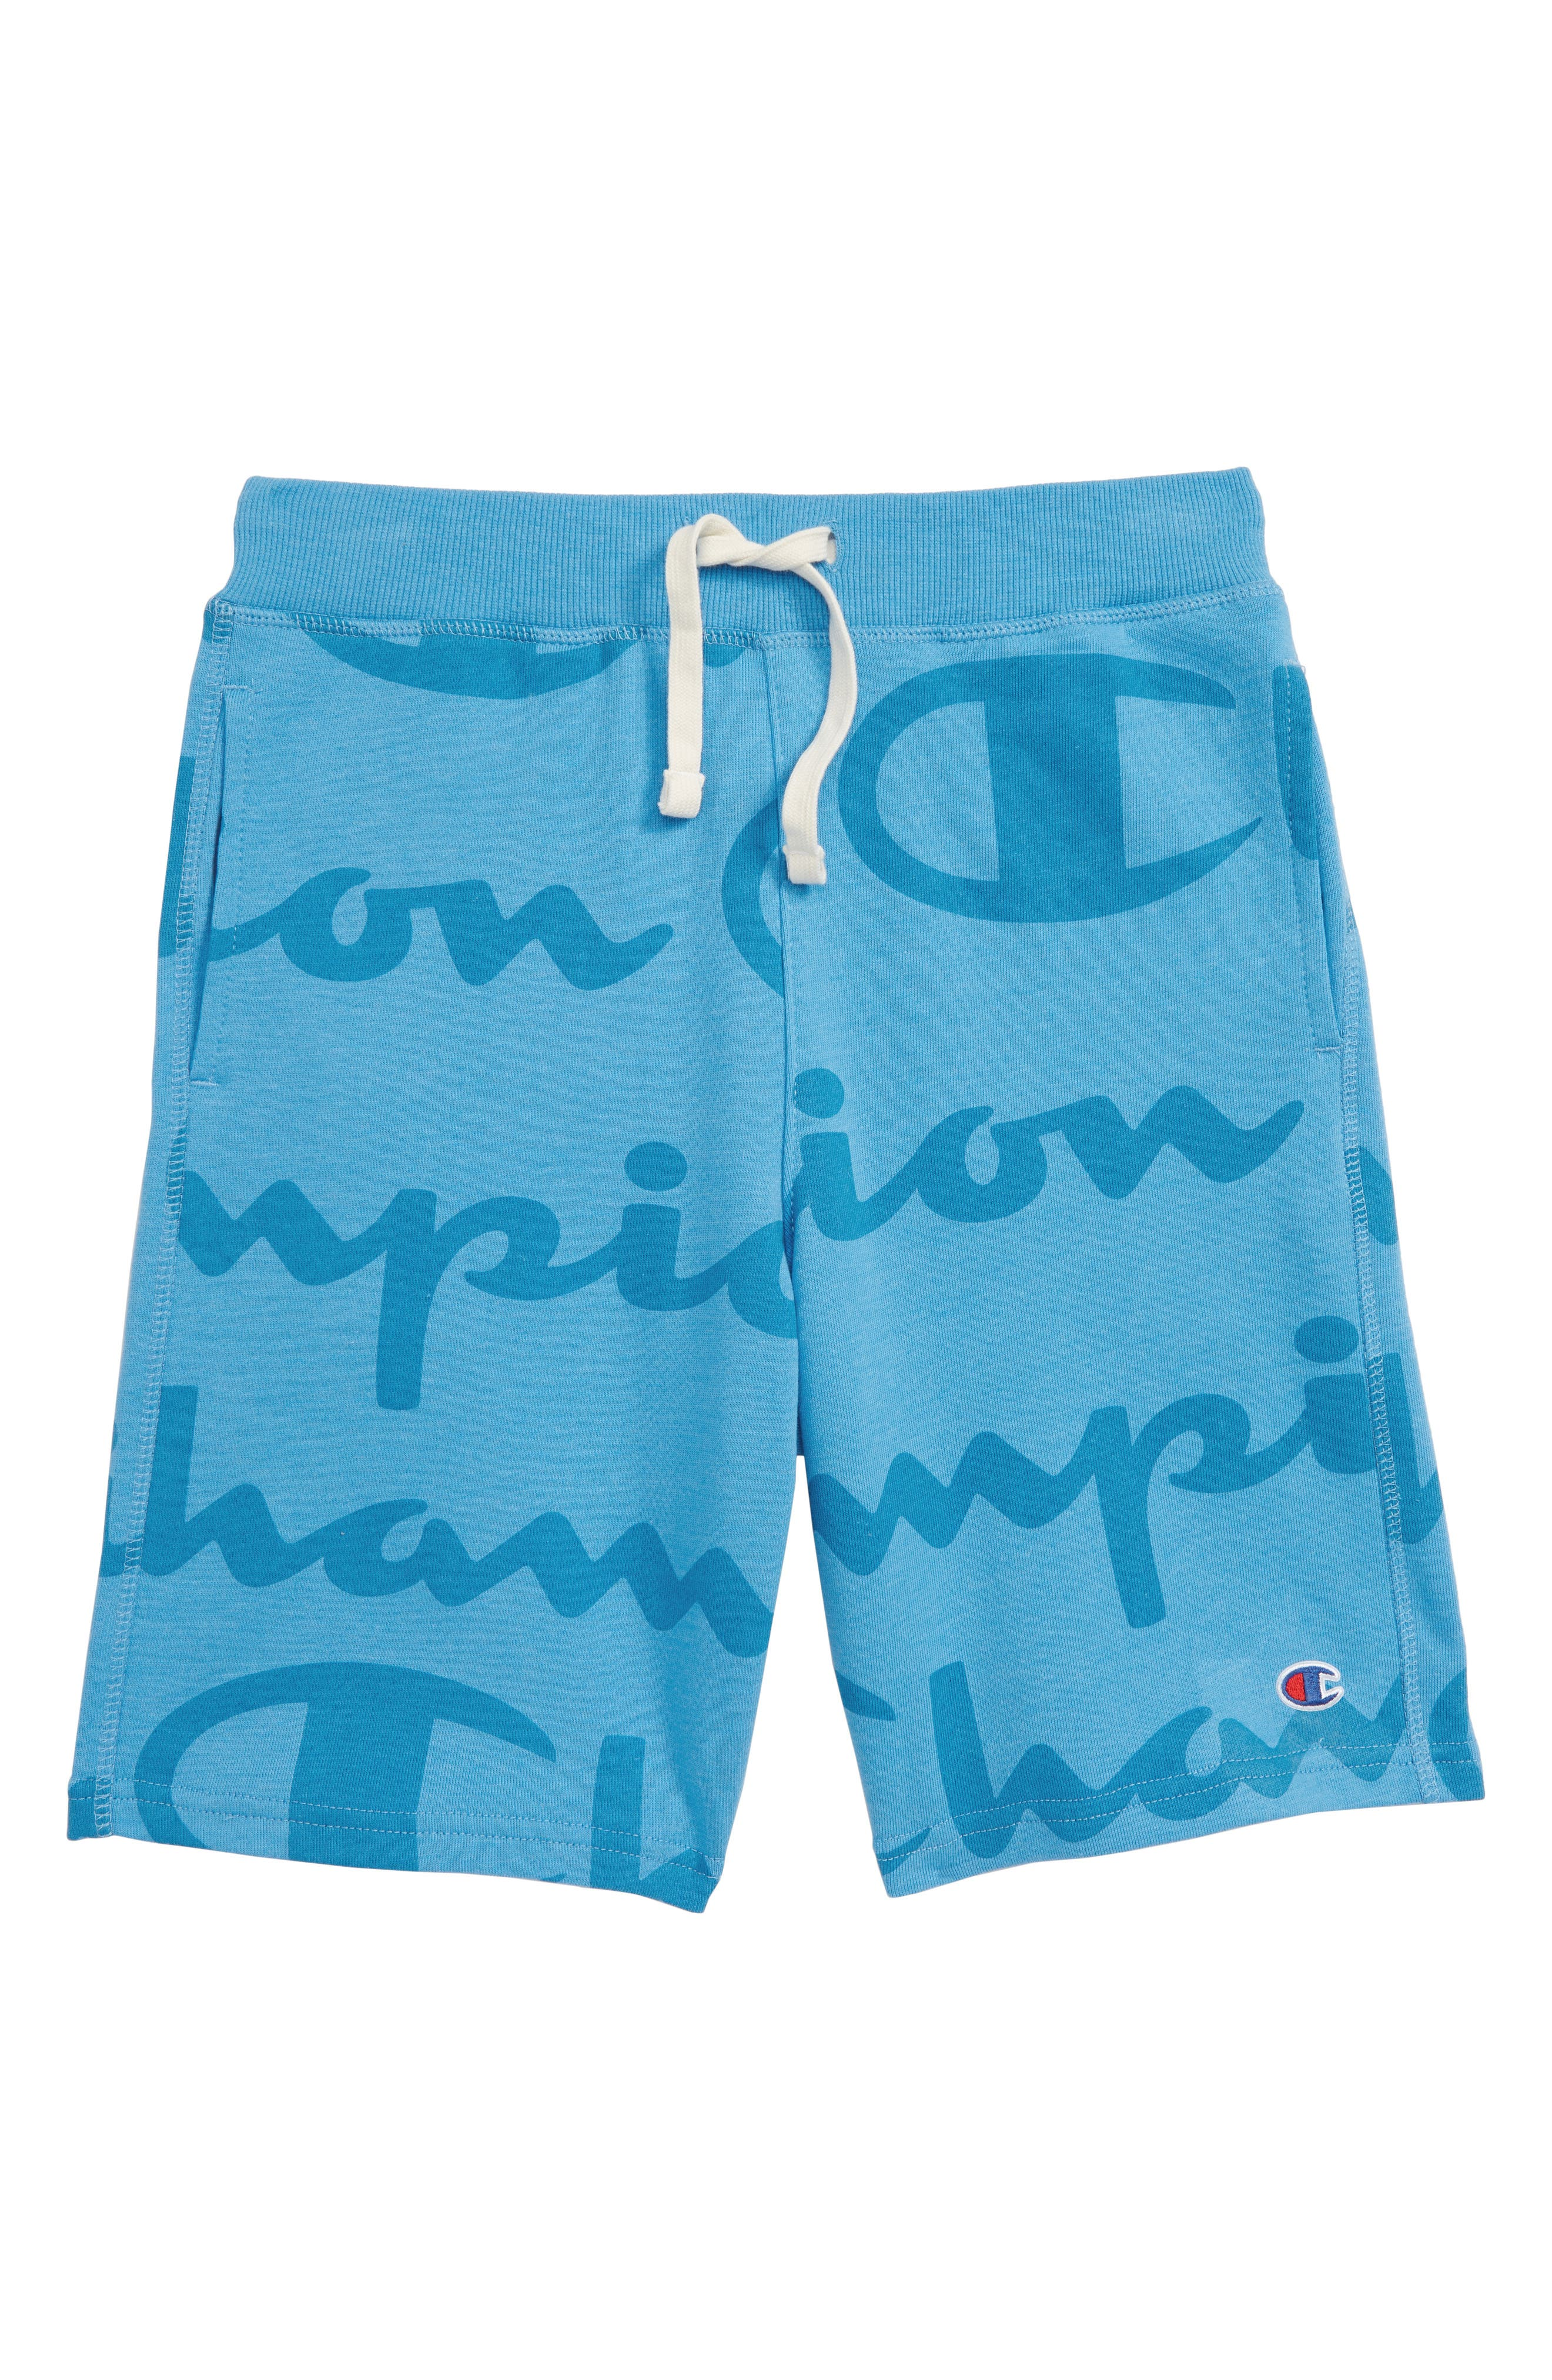 4a8c415e8843 Boys  Champion Clothes (Sizes 8-20)  T-Shirts